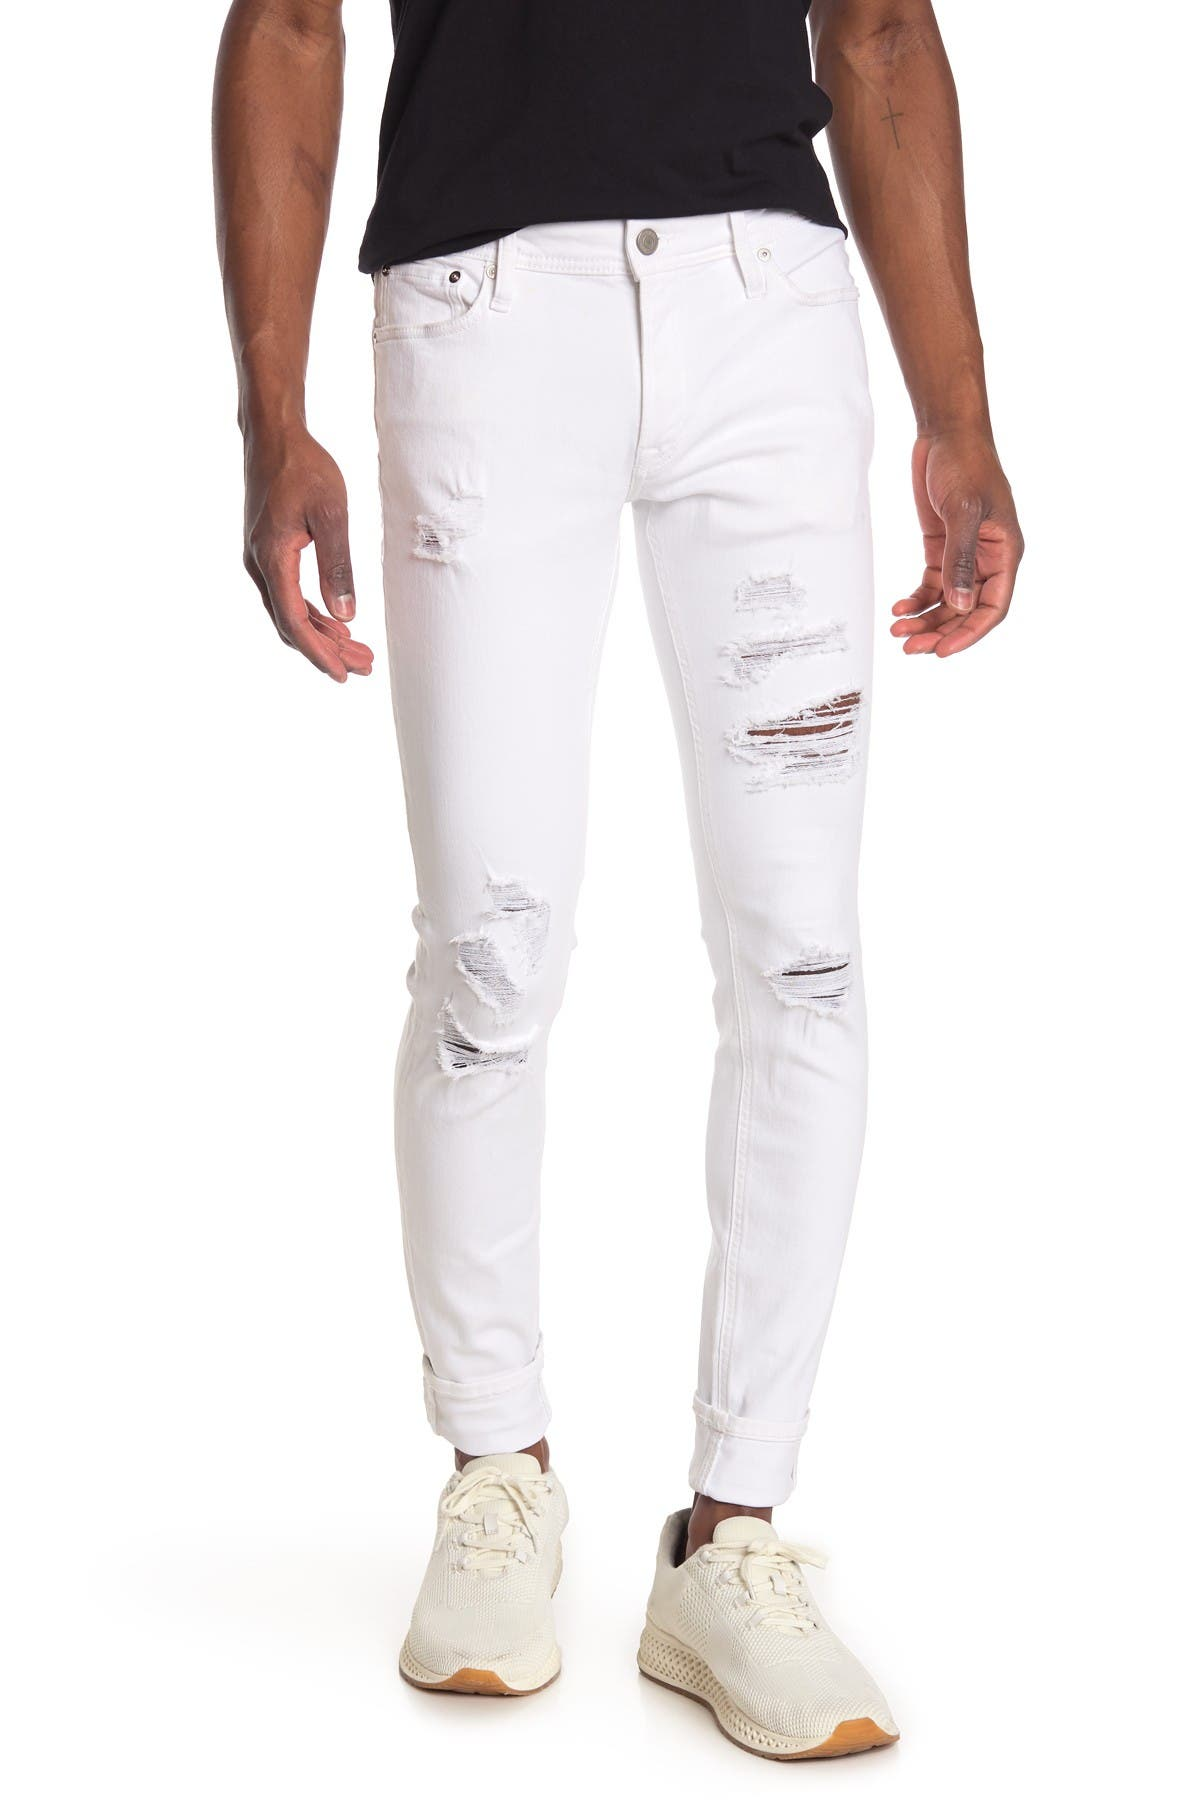 Image of JACK & JONES Liam Original 802 Jeans